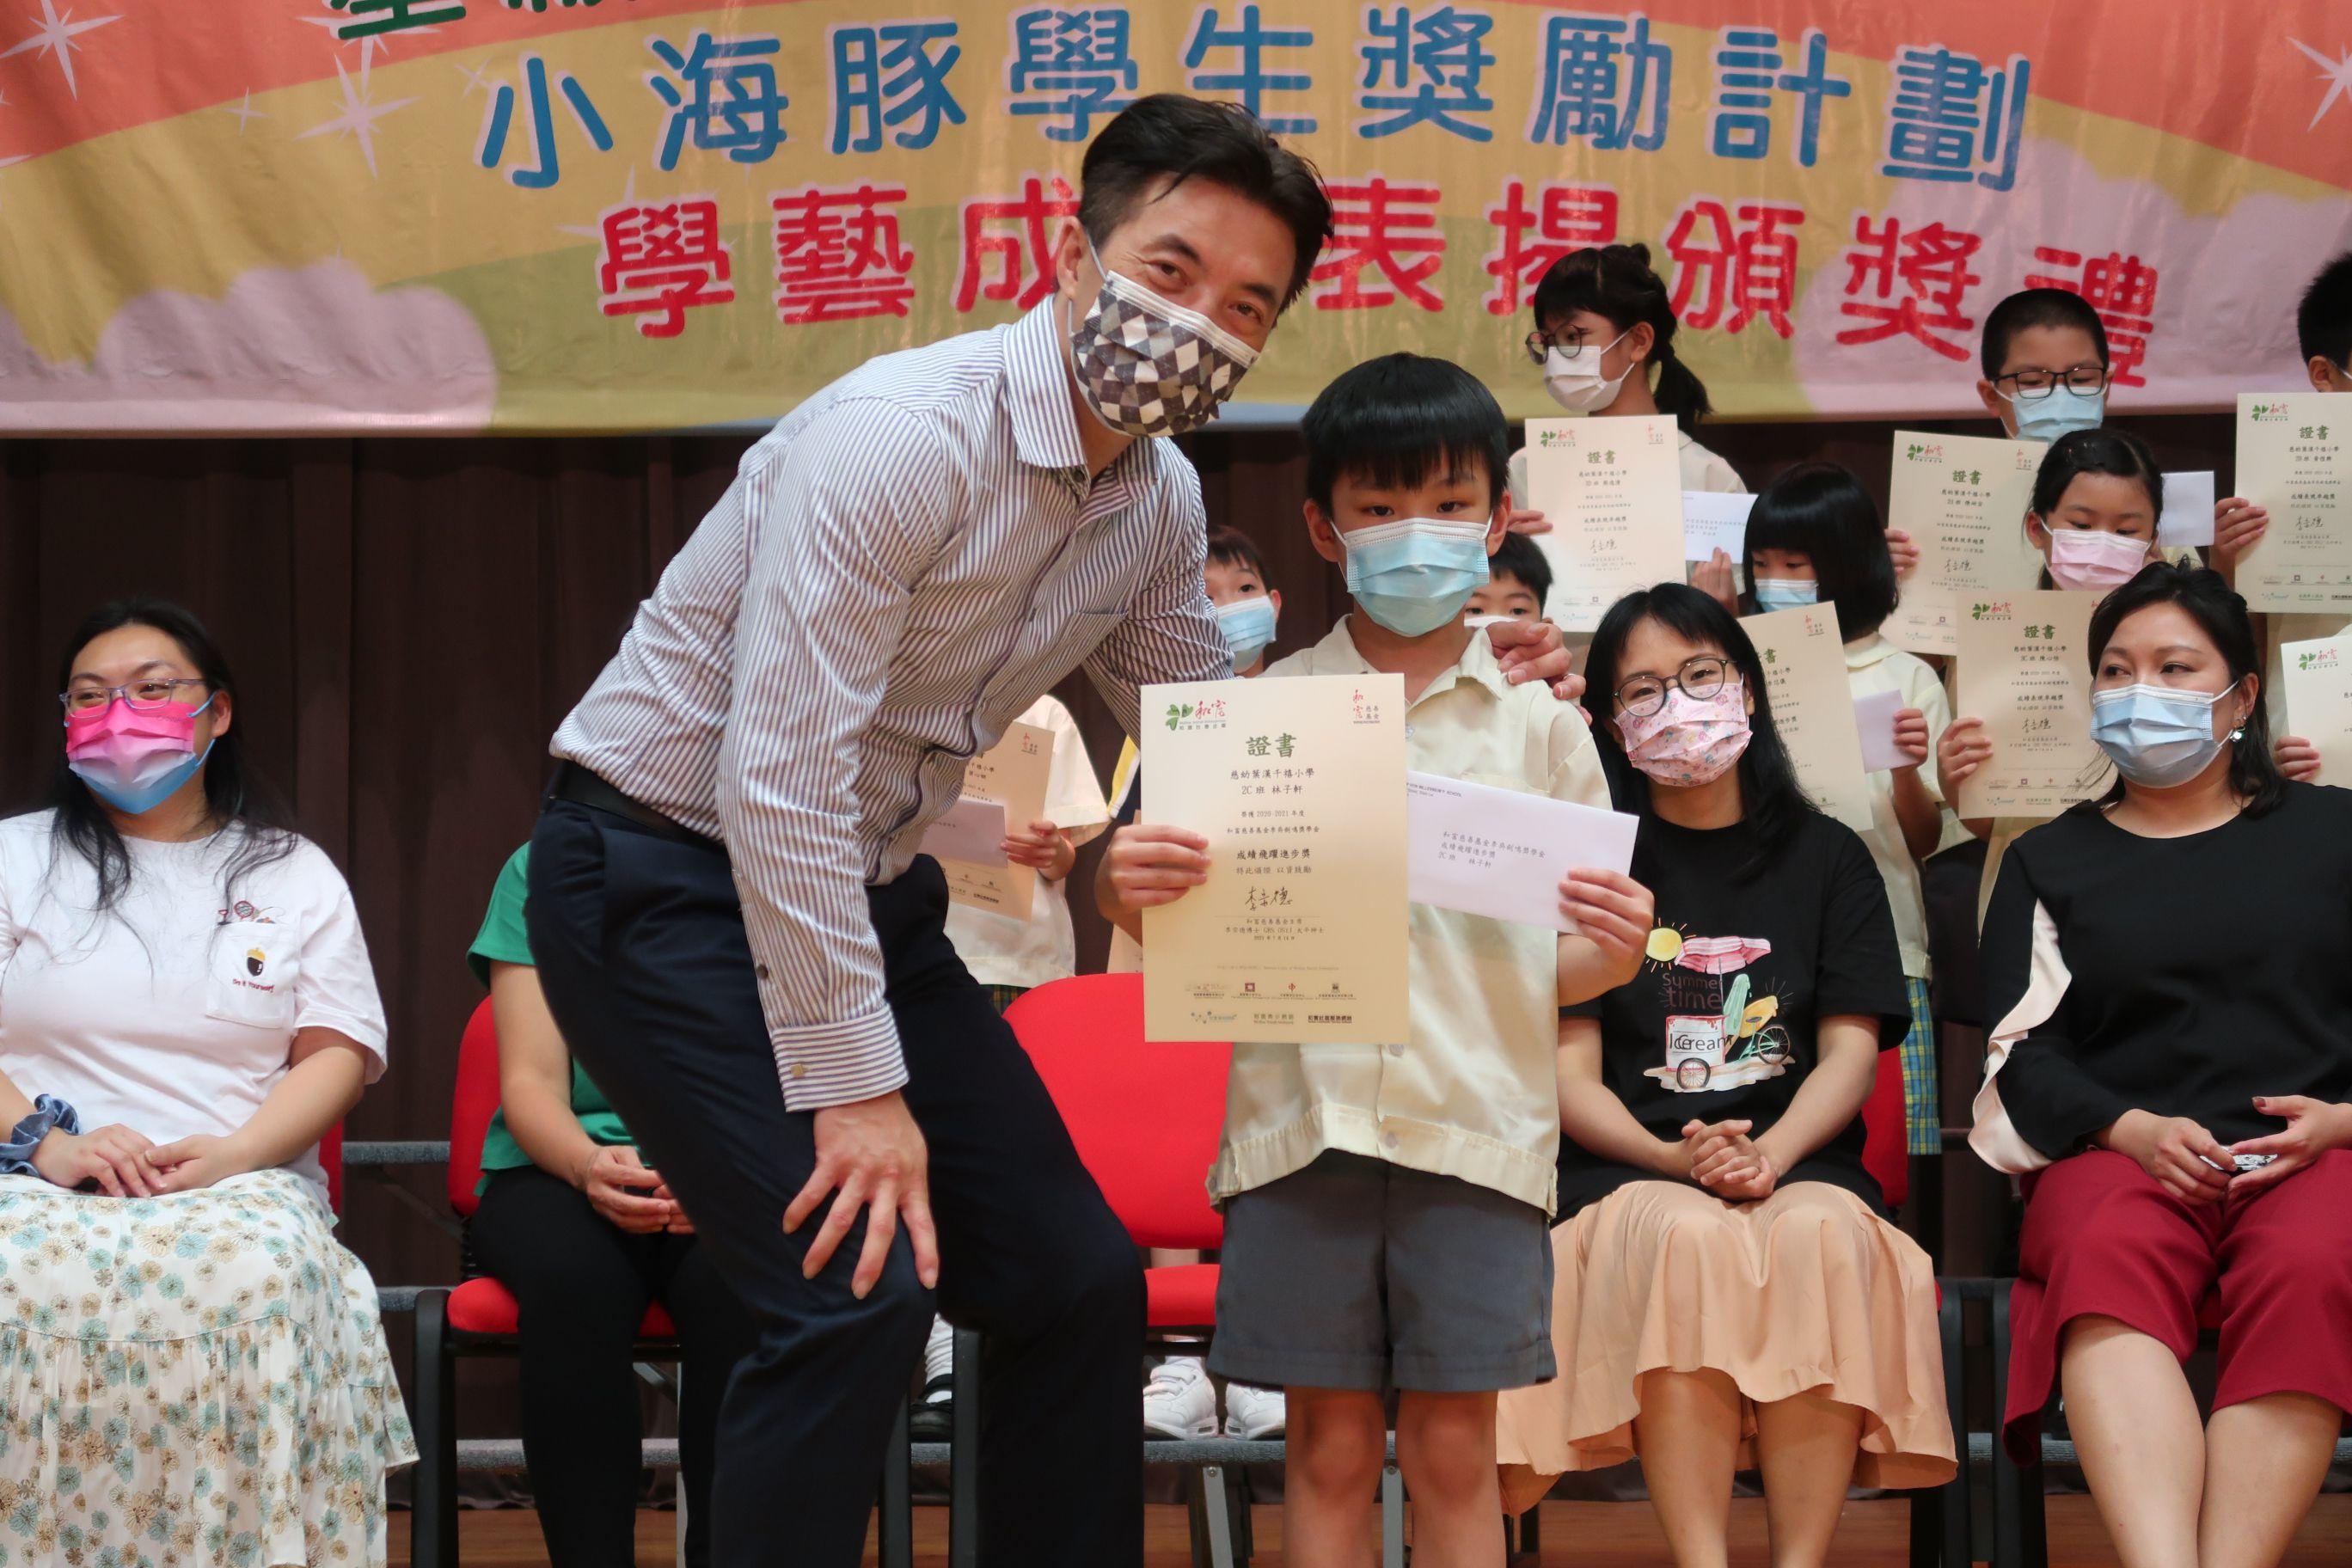 https://syh.edu.hk/sites/default/files/img_5941_1.jpg